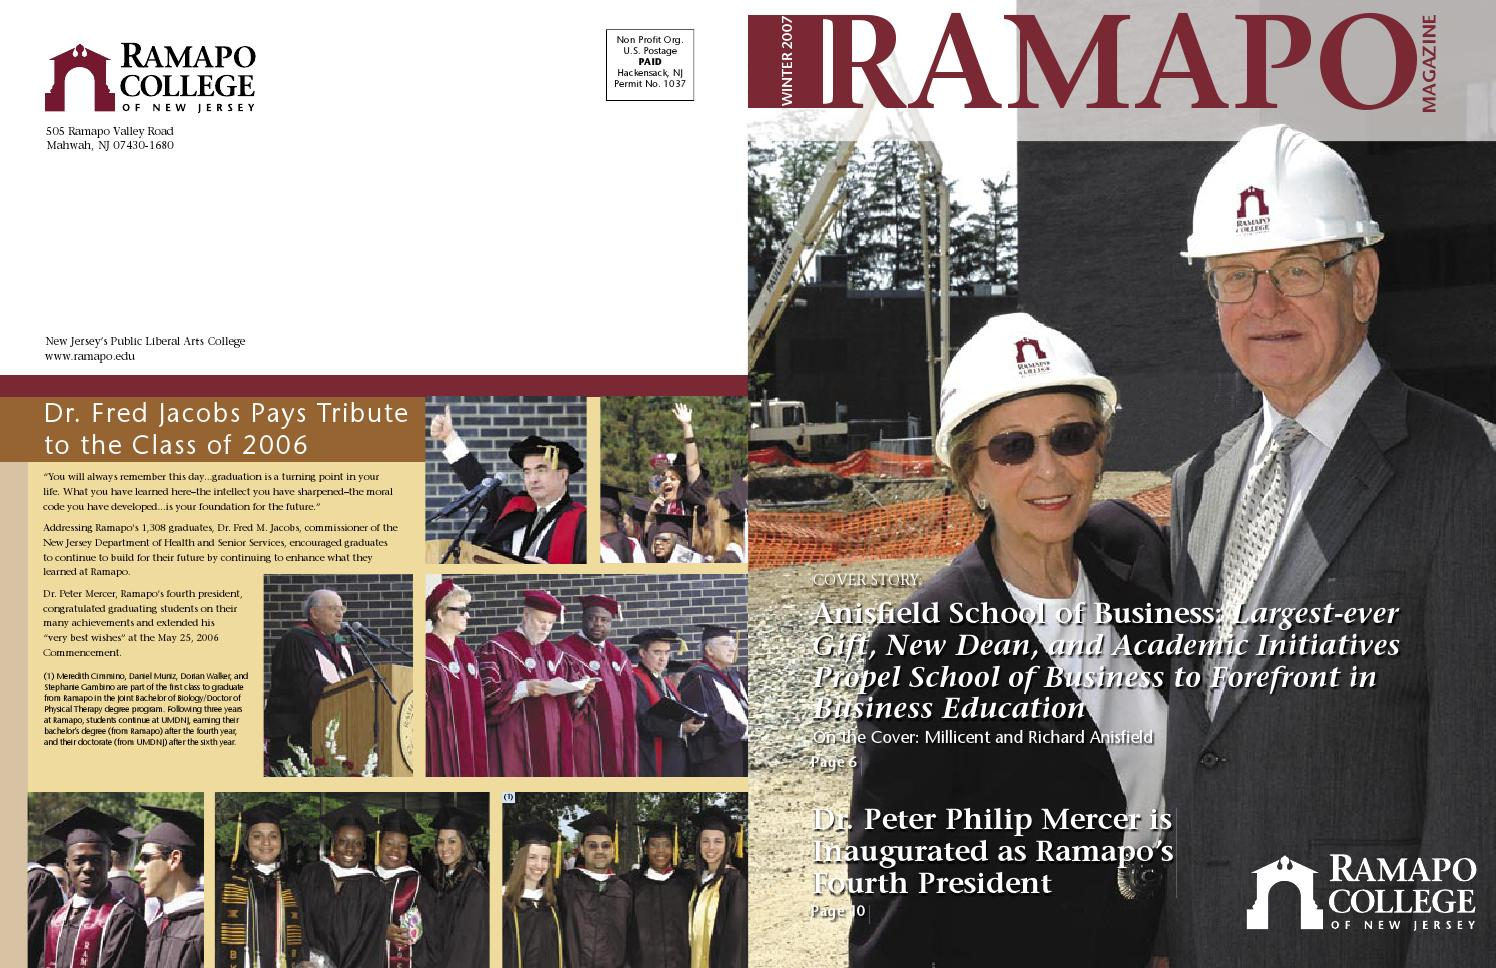 Ramapo College Magazine Winter 2007 by Ramapo College - issuu